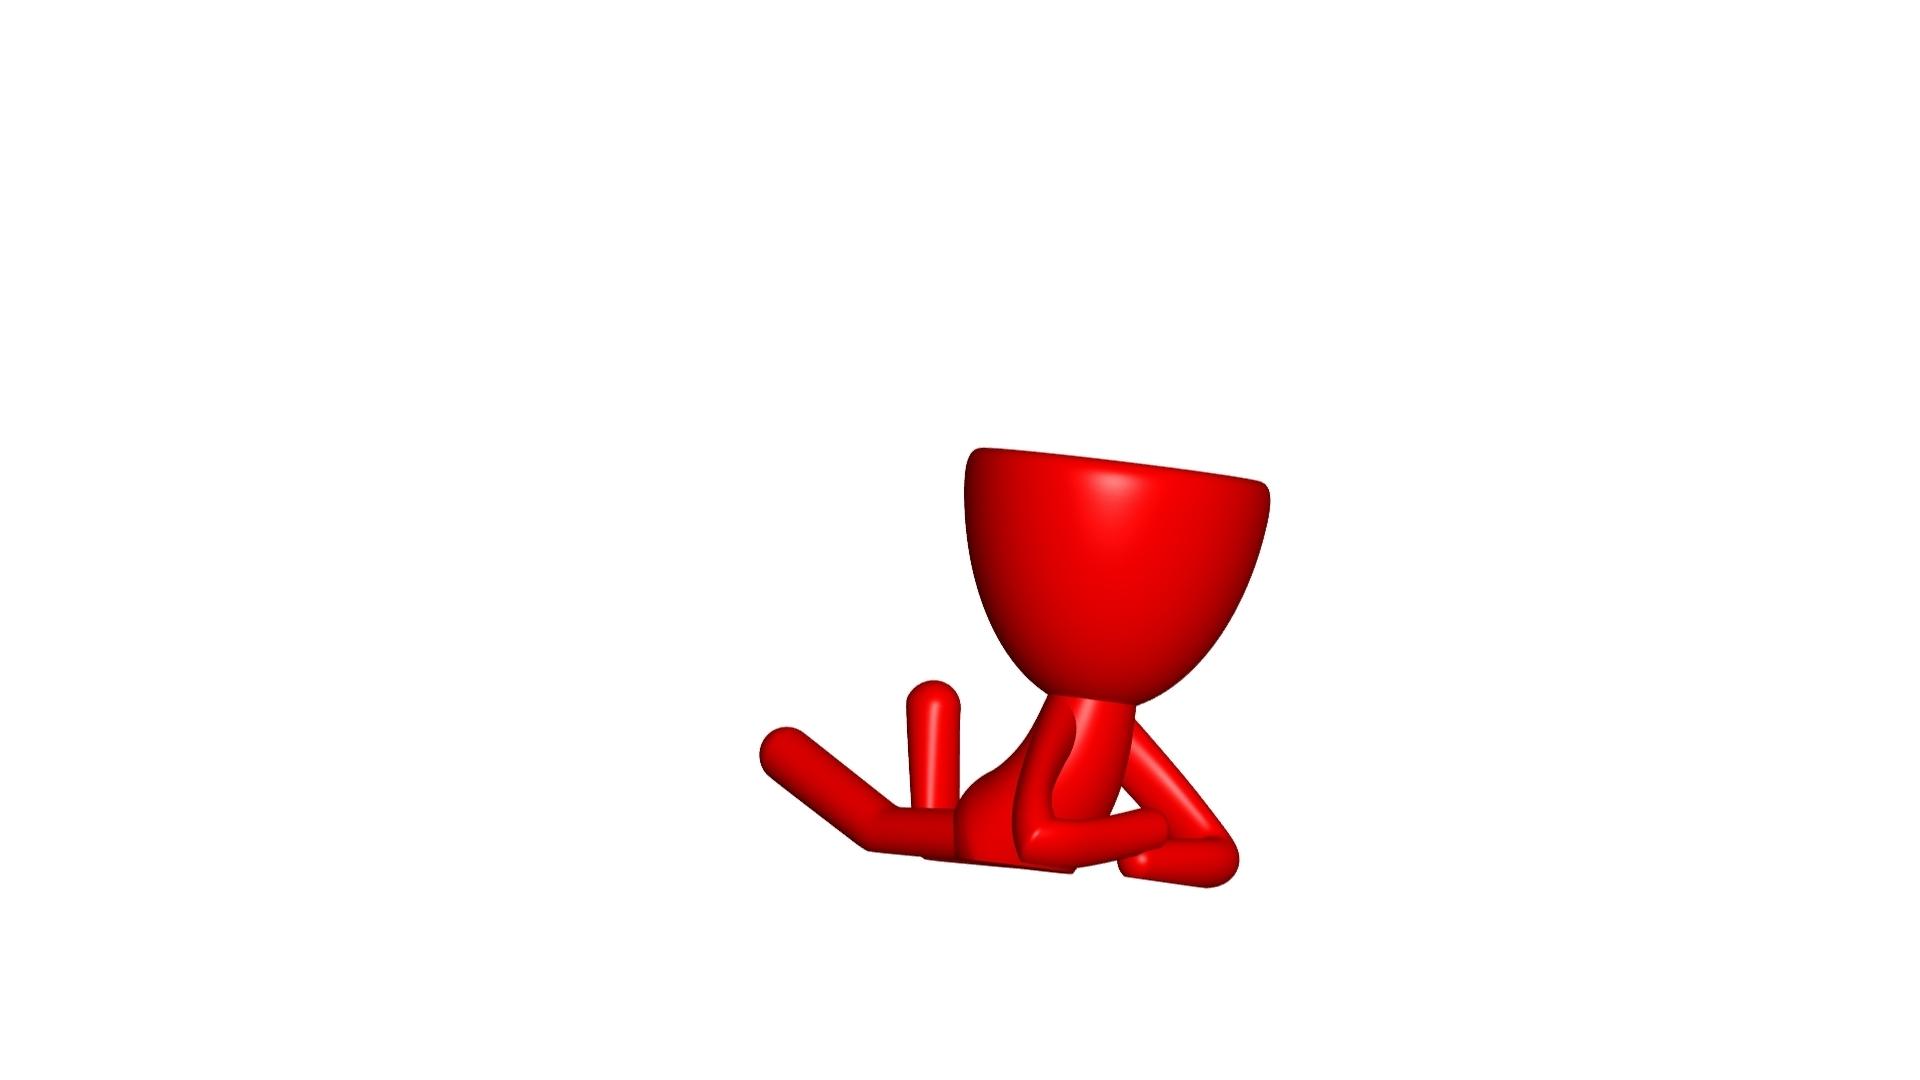 Vaso_02_Rojo.jpg Download free STL file JARRÓN MACETA ROBERT 02 - VASE FLOWERPOT ROBERT 02 • 3D print model, PRODUSTL56